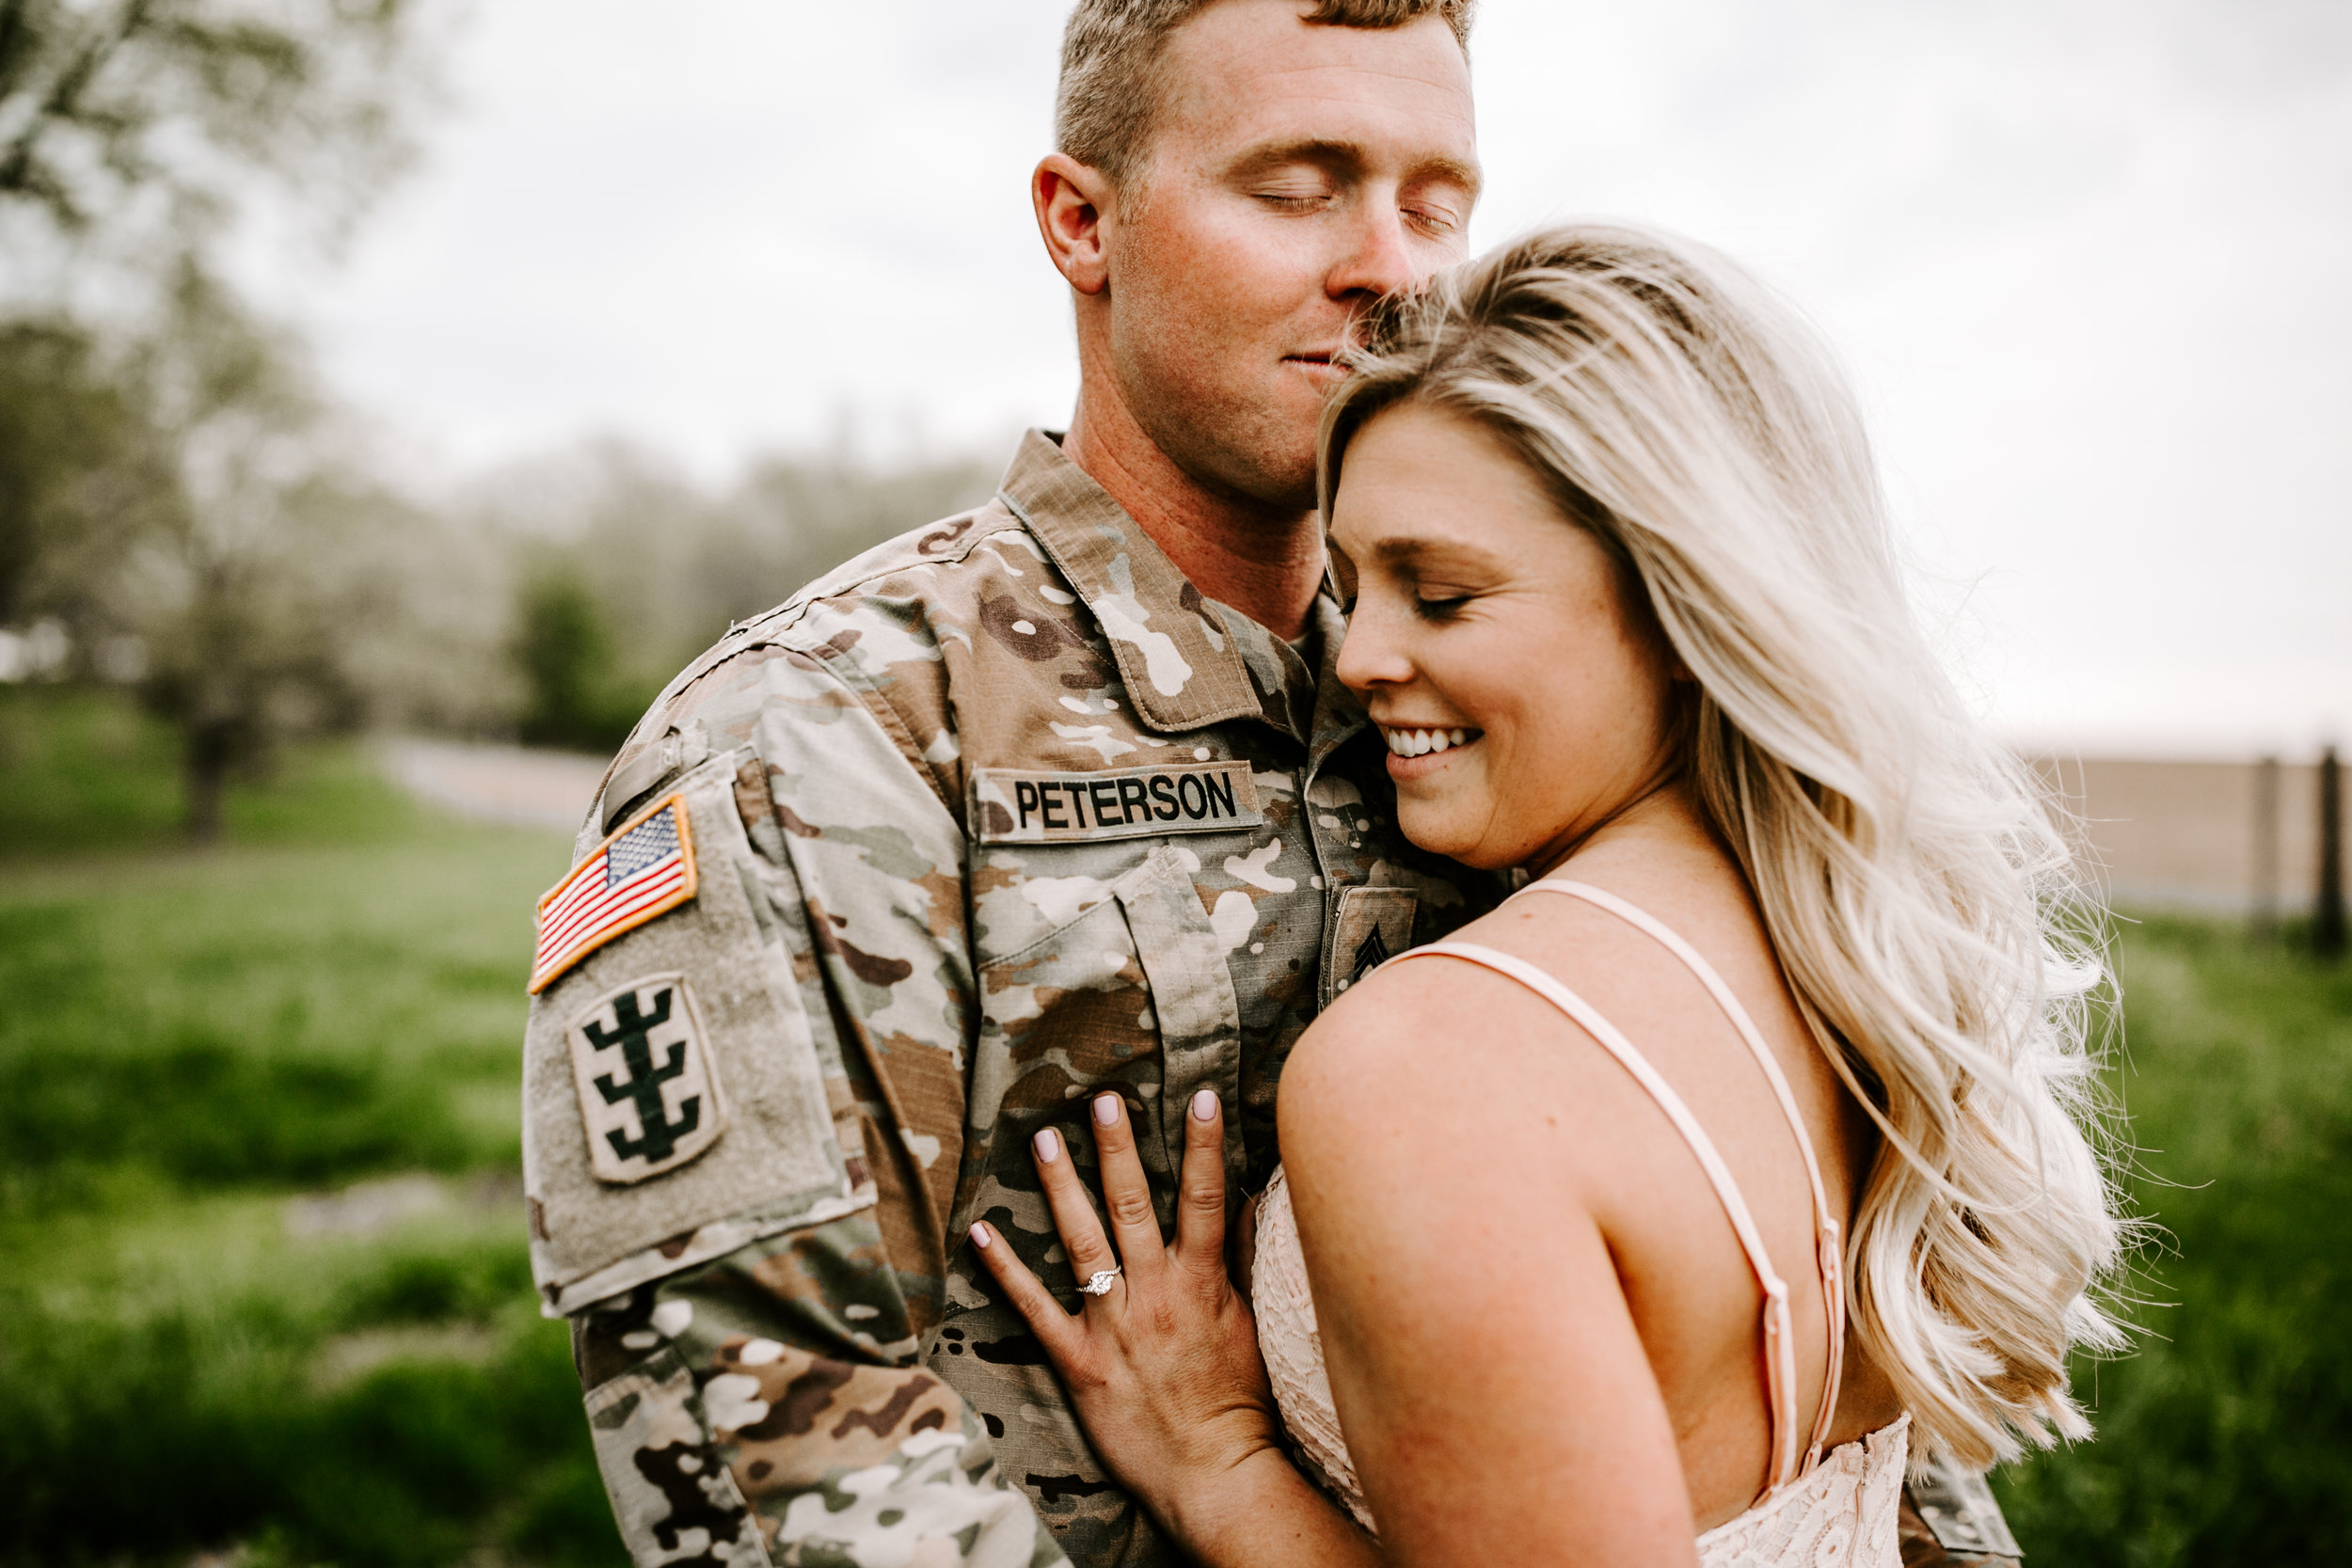 gracetphotography-wedding-photographer-adventure-bride-engagement-31.jpg